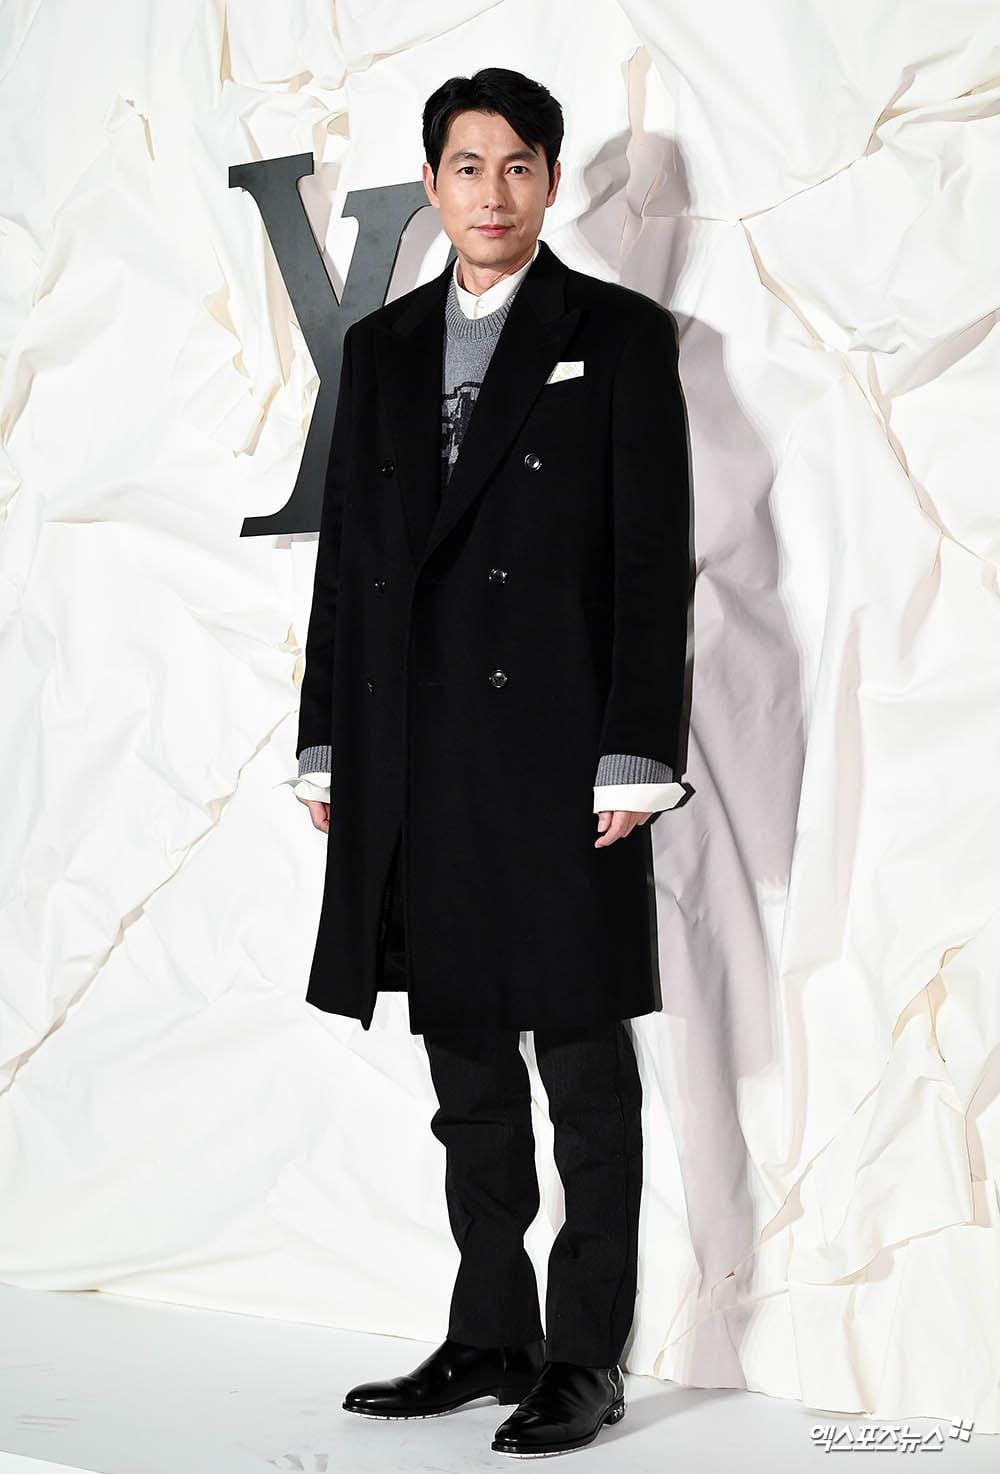 https://0.soompi.io/wp-content/uploads/2019/10/31074859/Jung-Woo-Sung-XPN.jpg